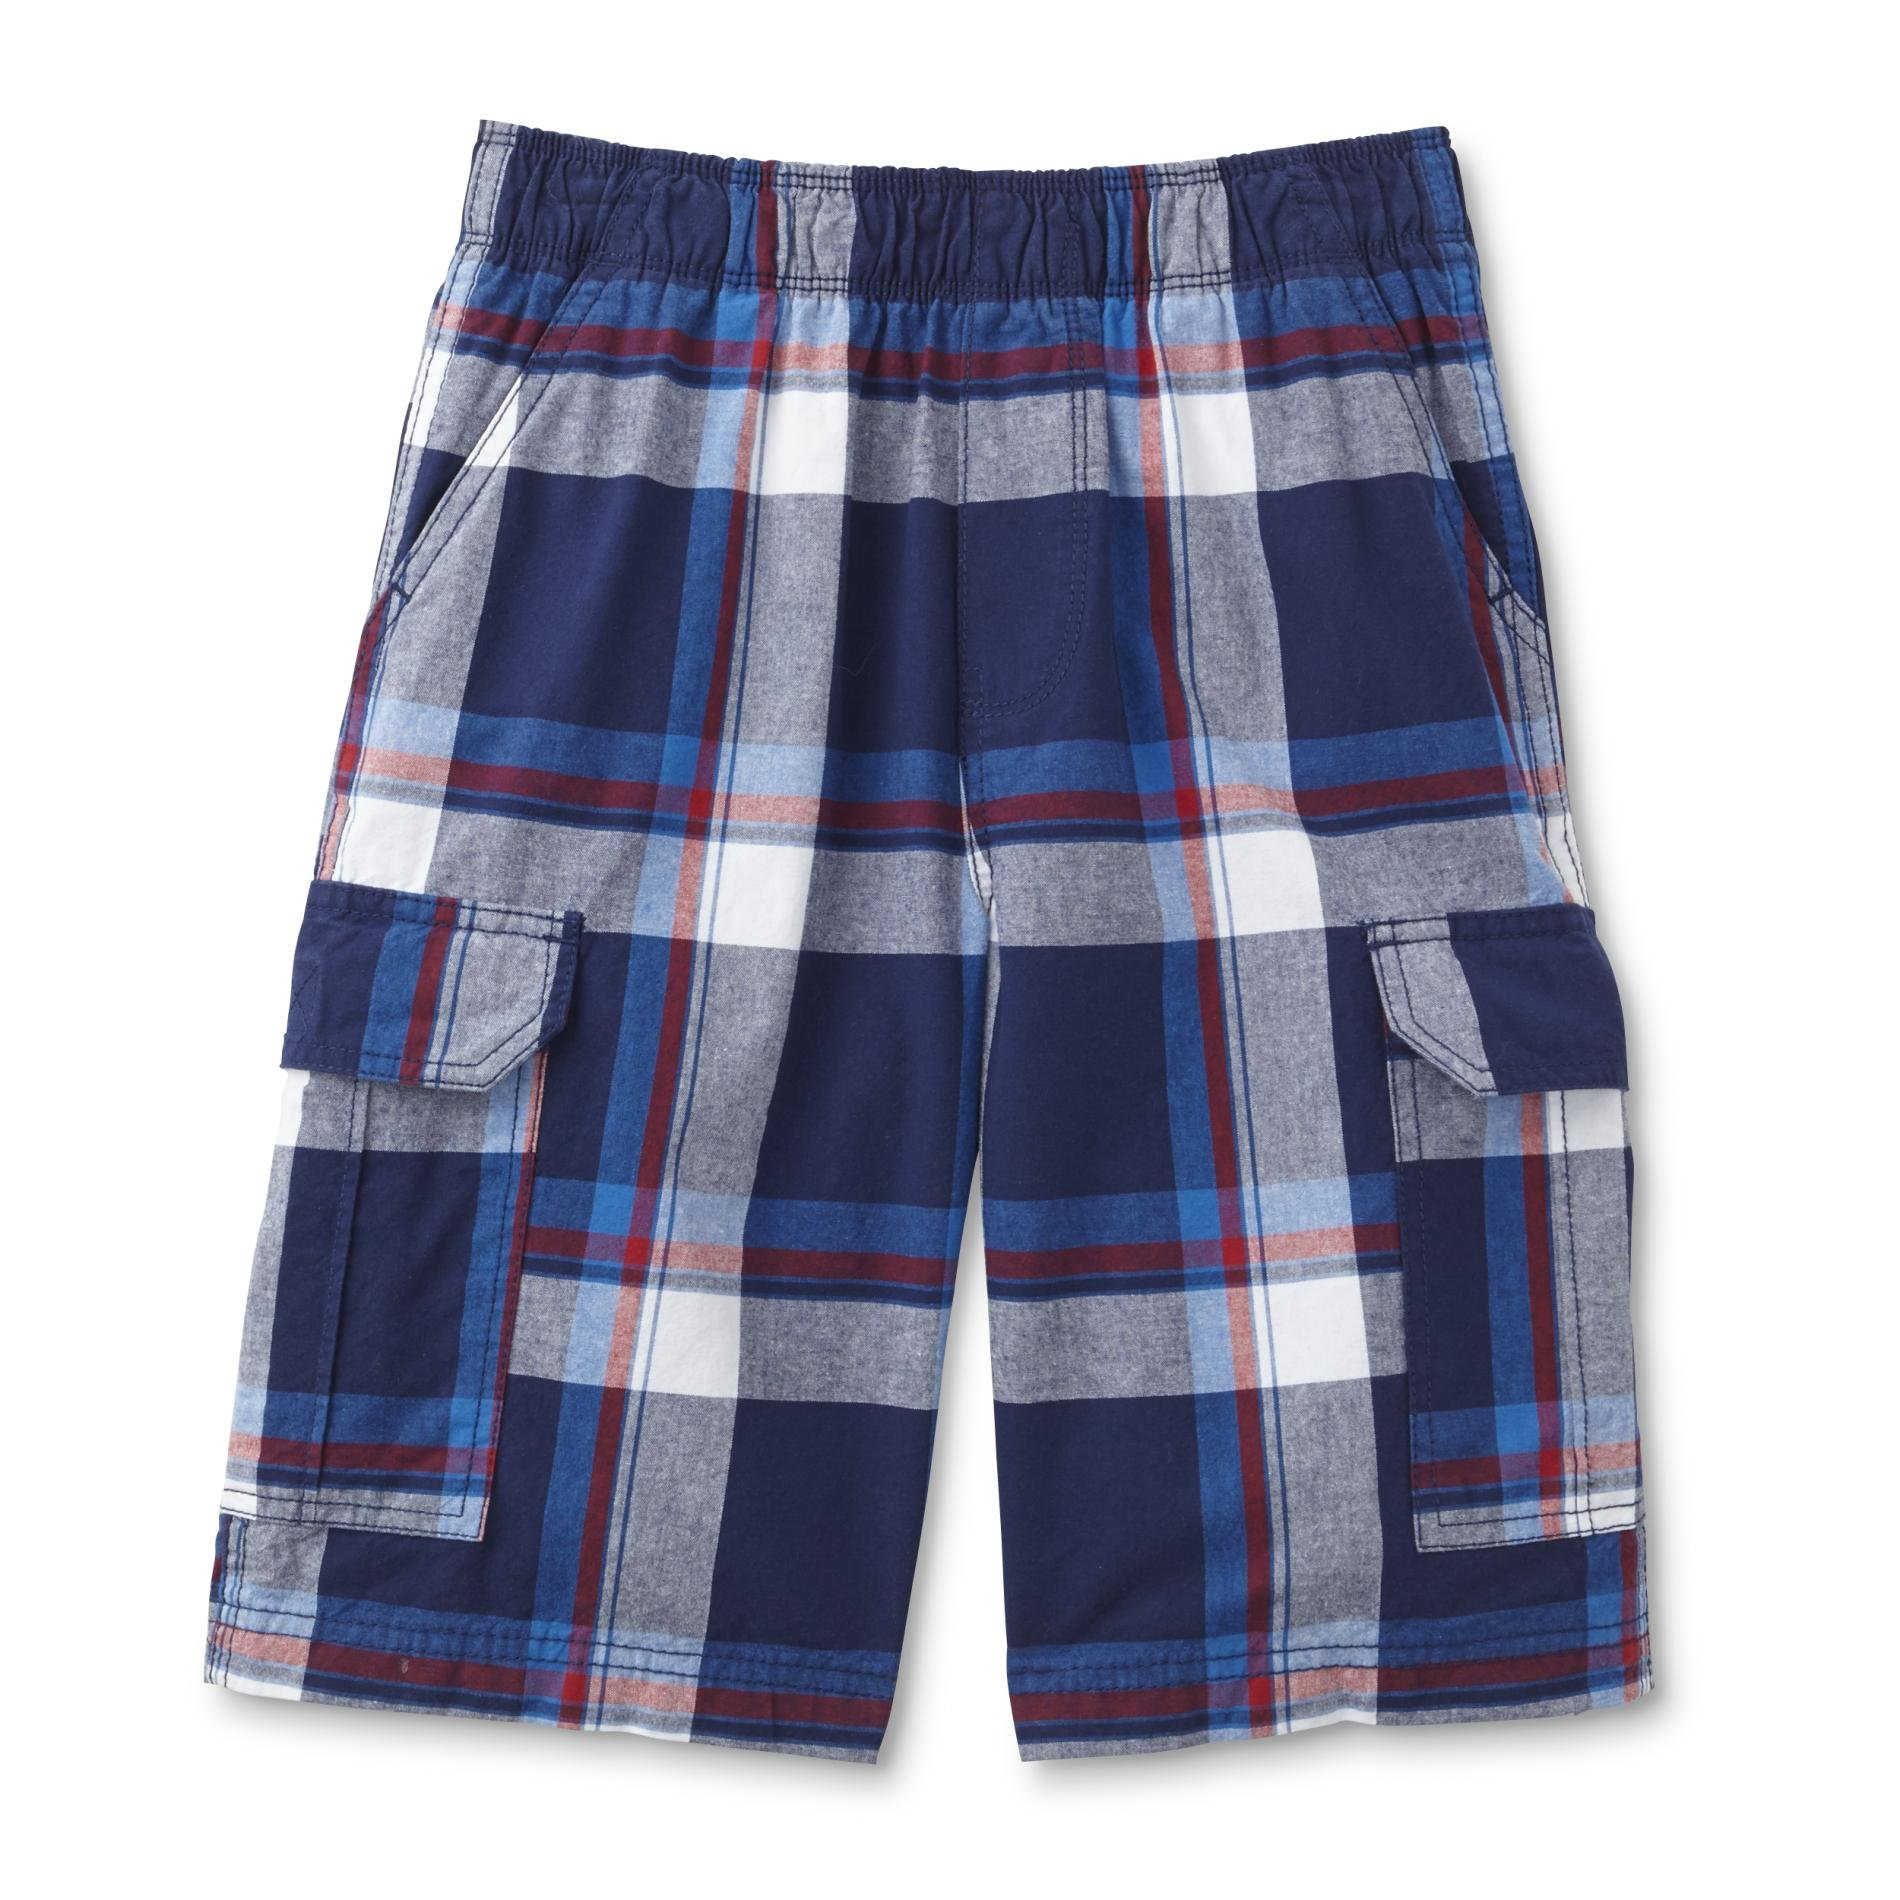 Boys Canyon River Blues Reg/ Husky Cargo Shorts (10/12yrs, Navy/Blu)